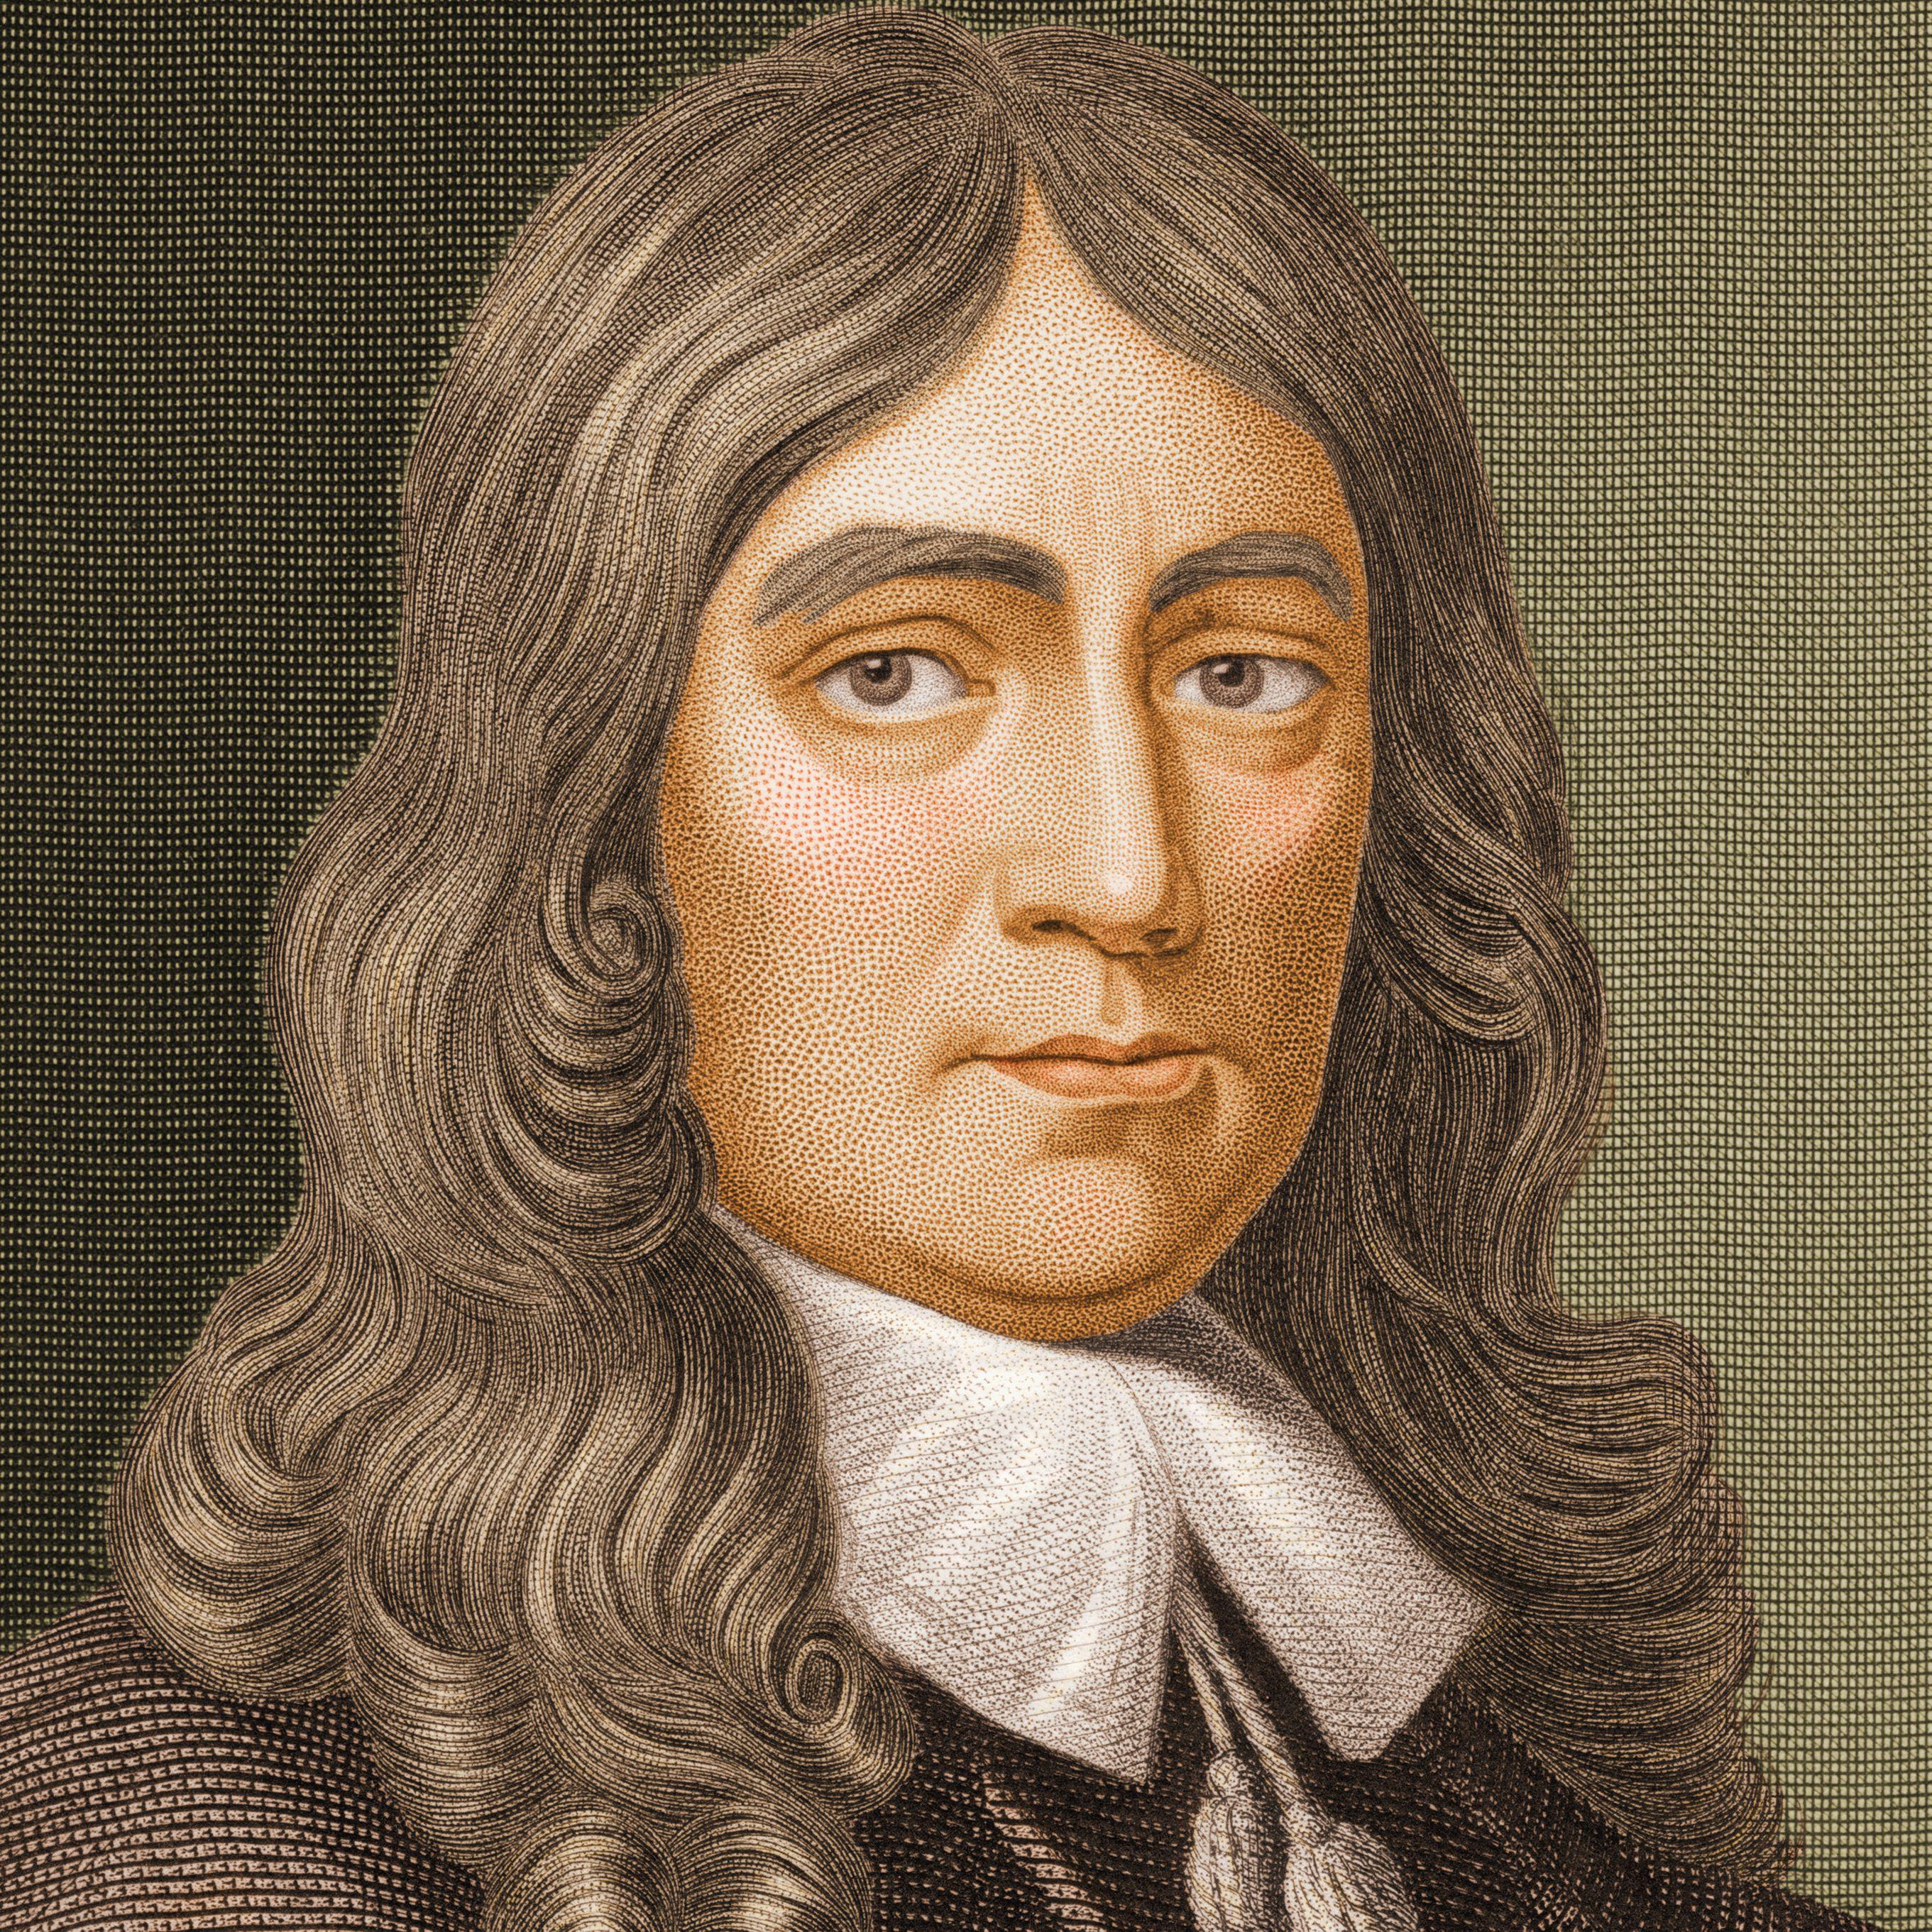 John Milton - Poet, Historian - Biography